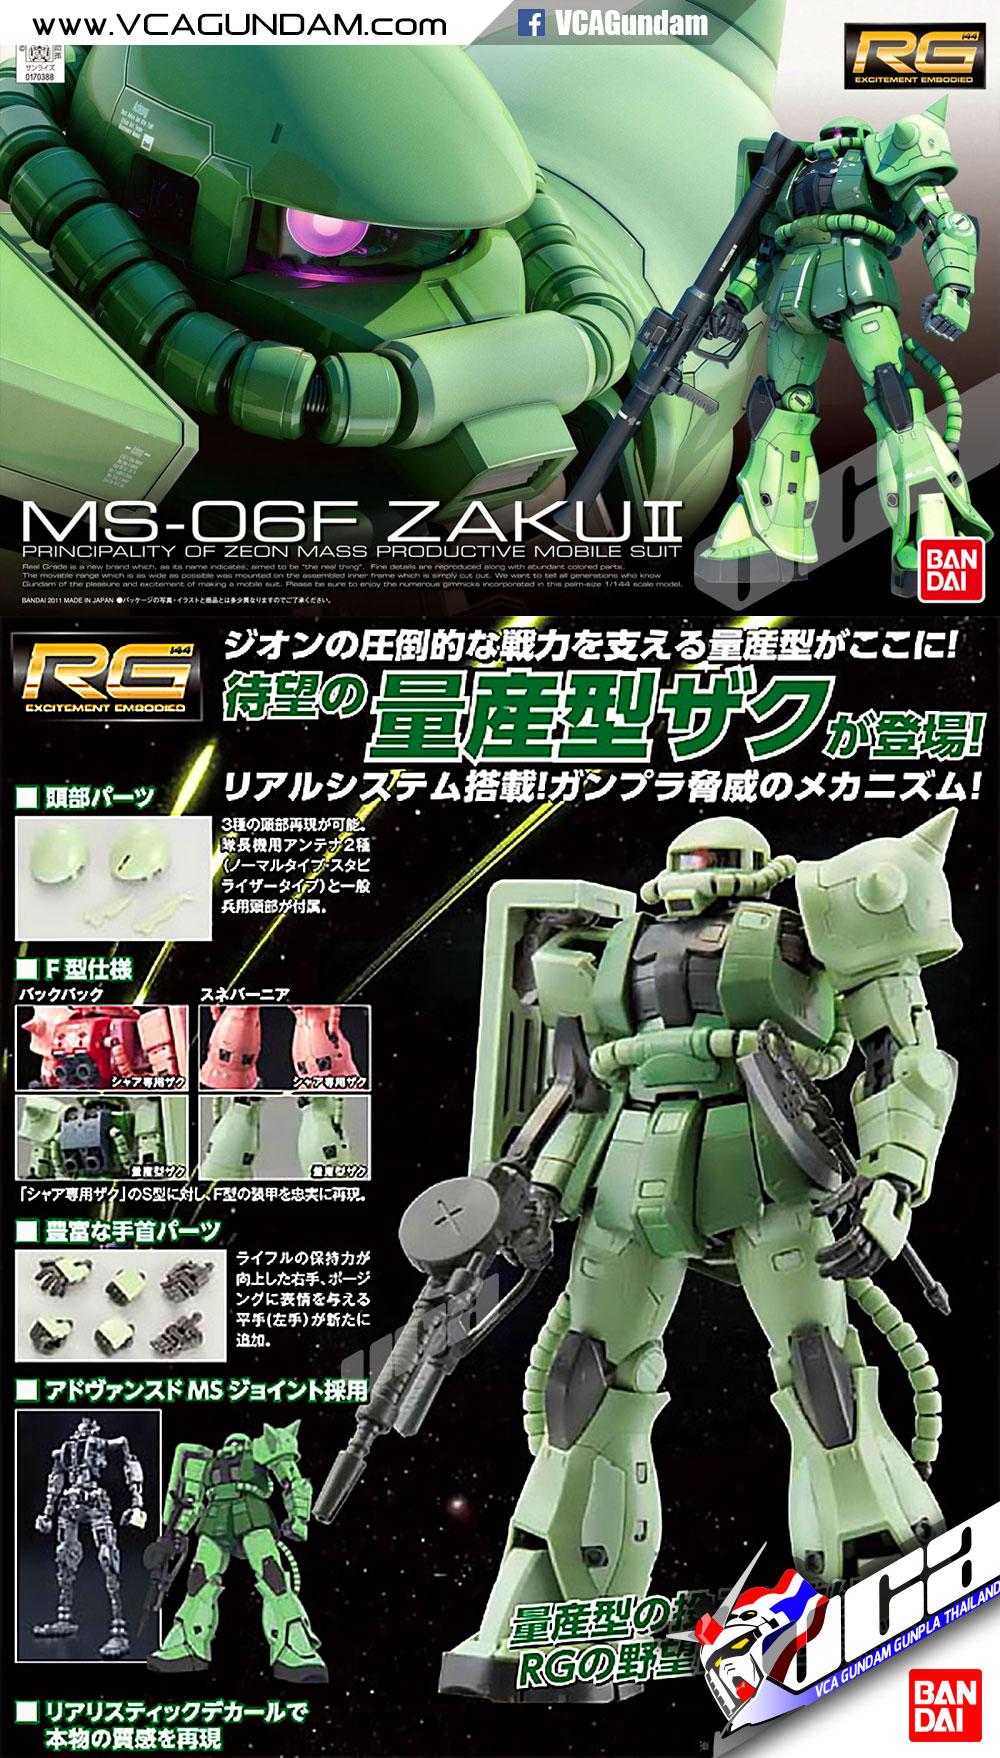 RG MS-06F ซาคุ ZAKU II